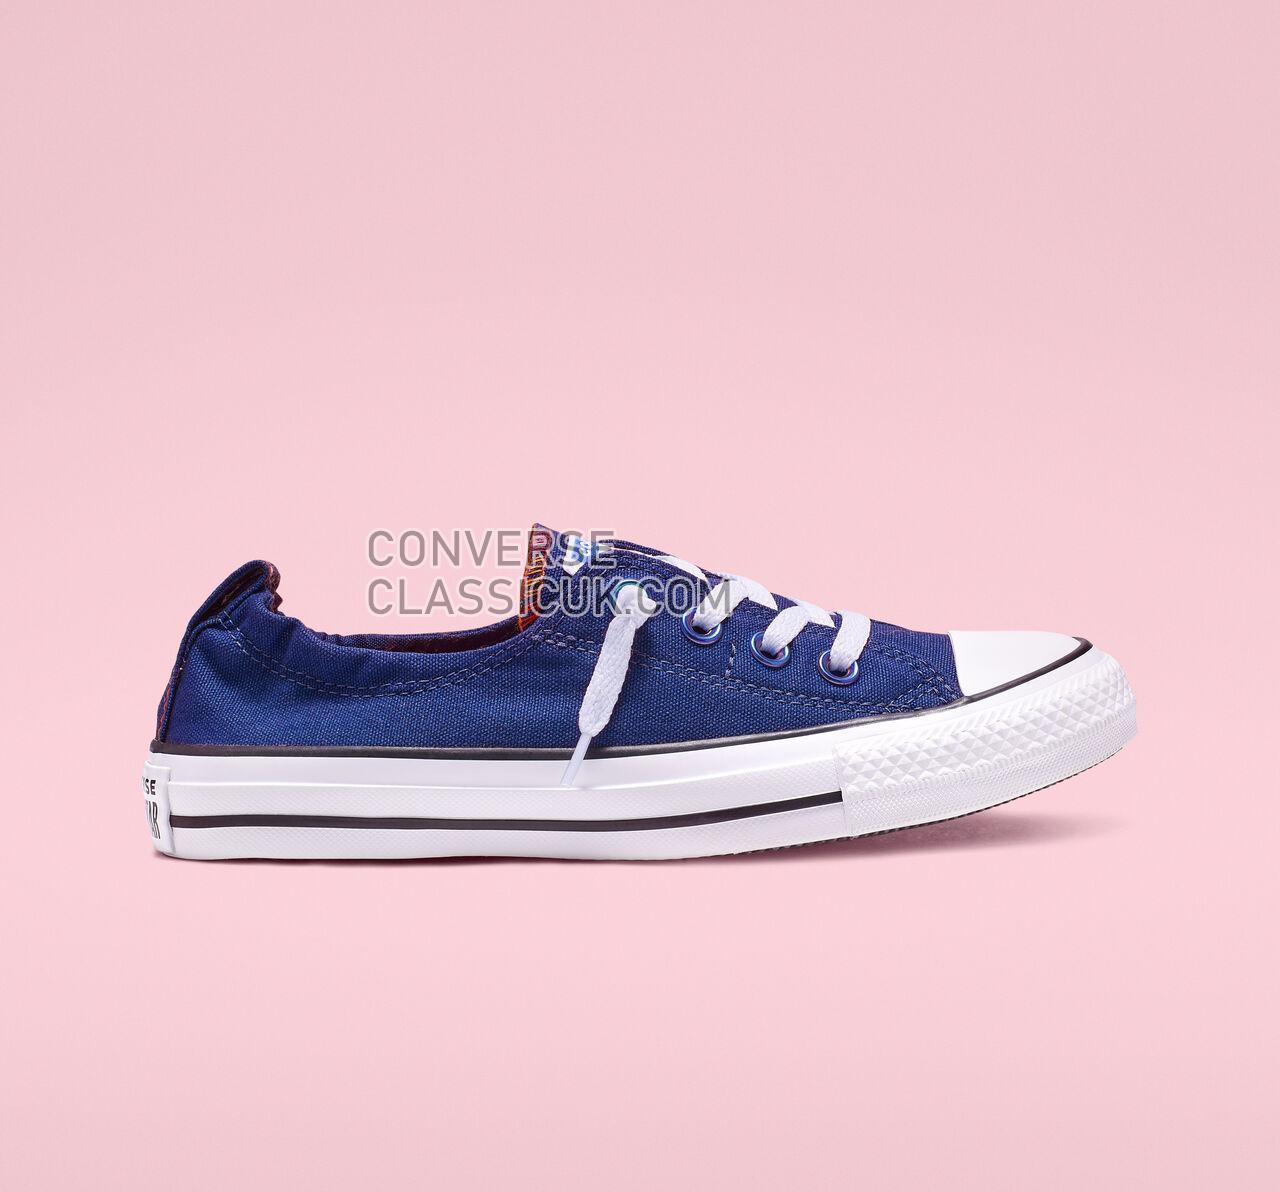 Converse Chuck Taylor All Star Shoreline Slip Womens 565443F Blue/White/Black Shoes